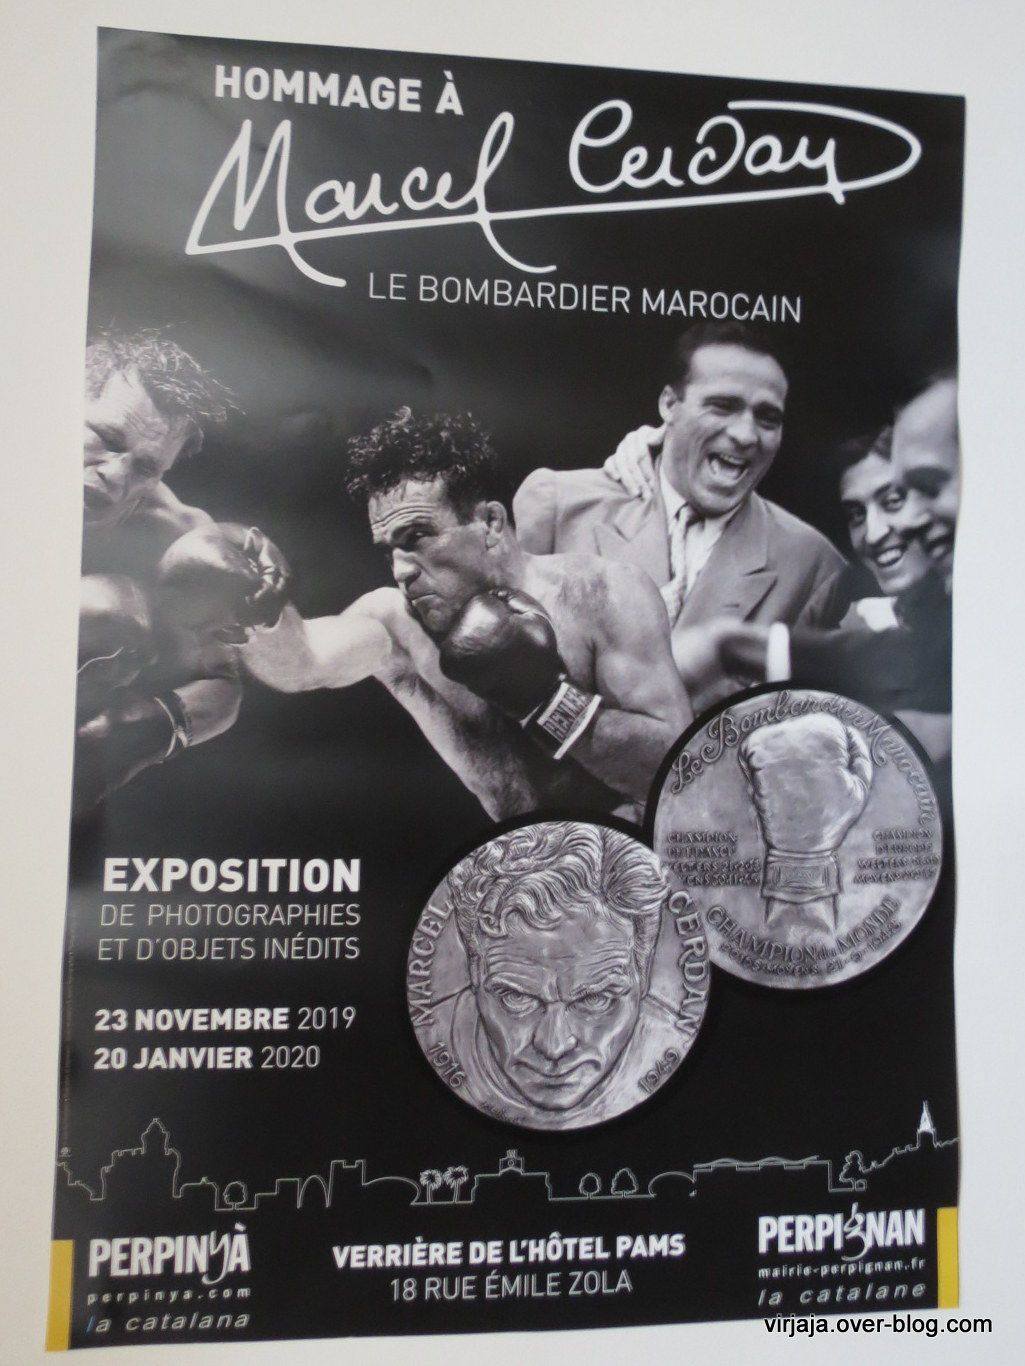 EXPO MARCEL CERDAN